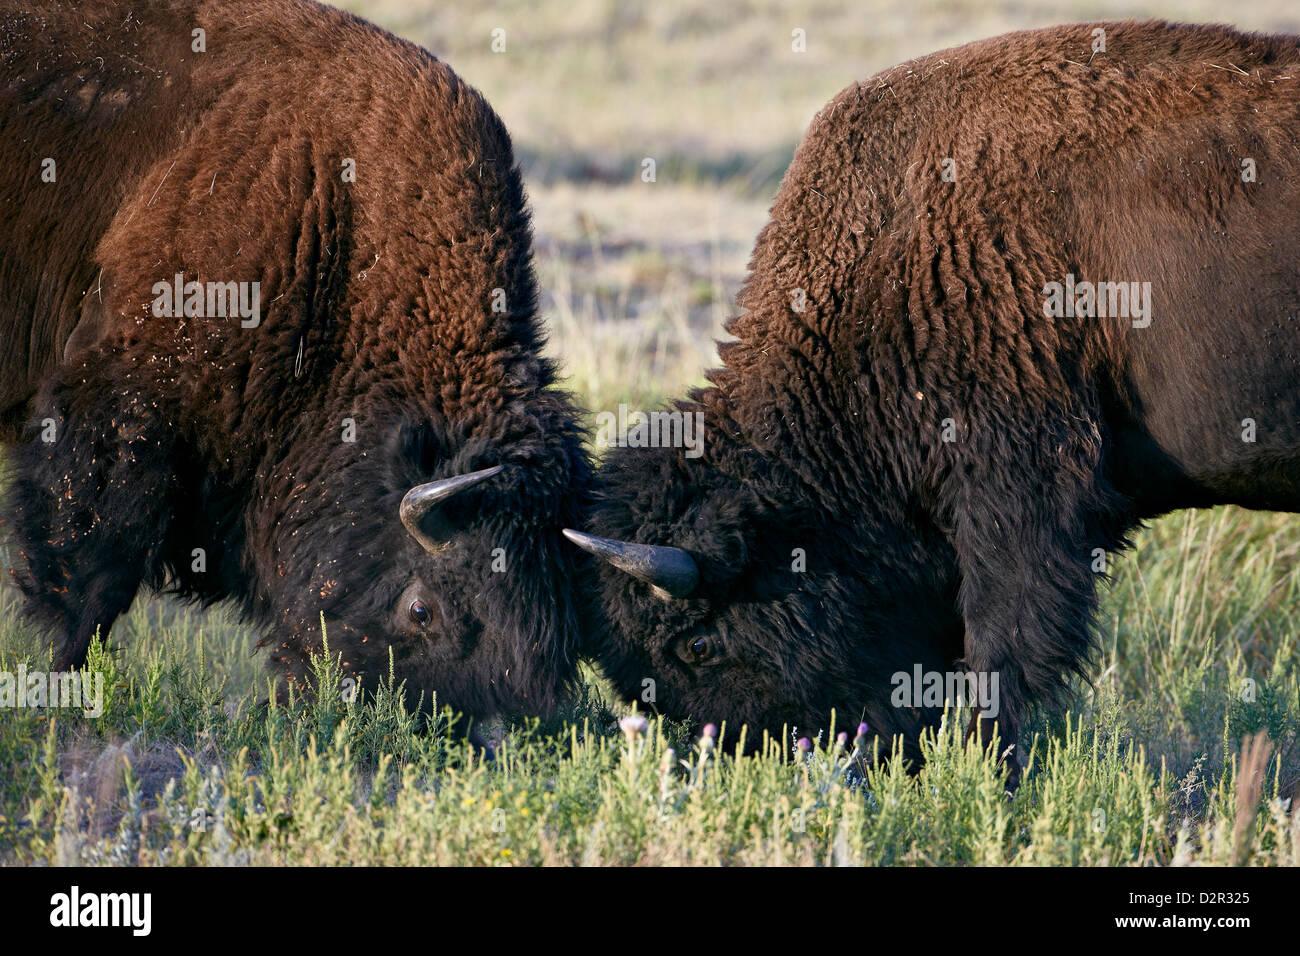 Bison (Bison bison) bulls sparring, Custer State Park, South Dakota, United States of America, North America - Stock Image